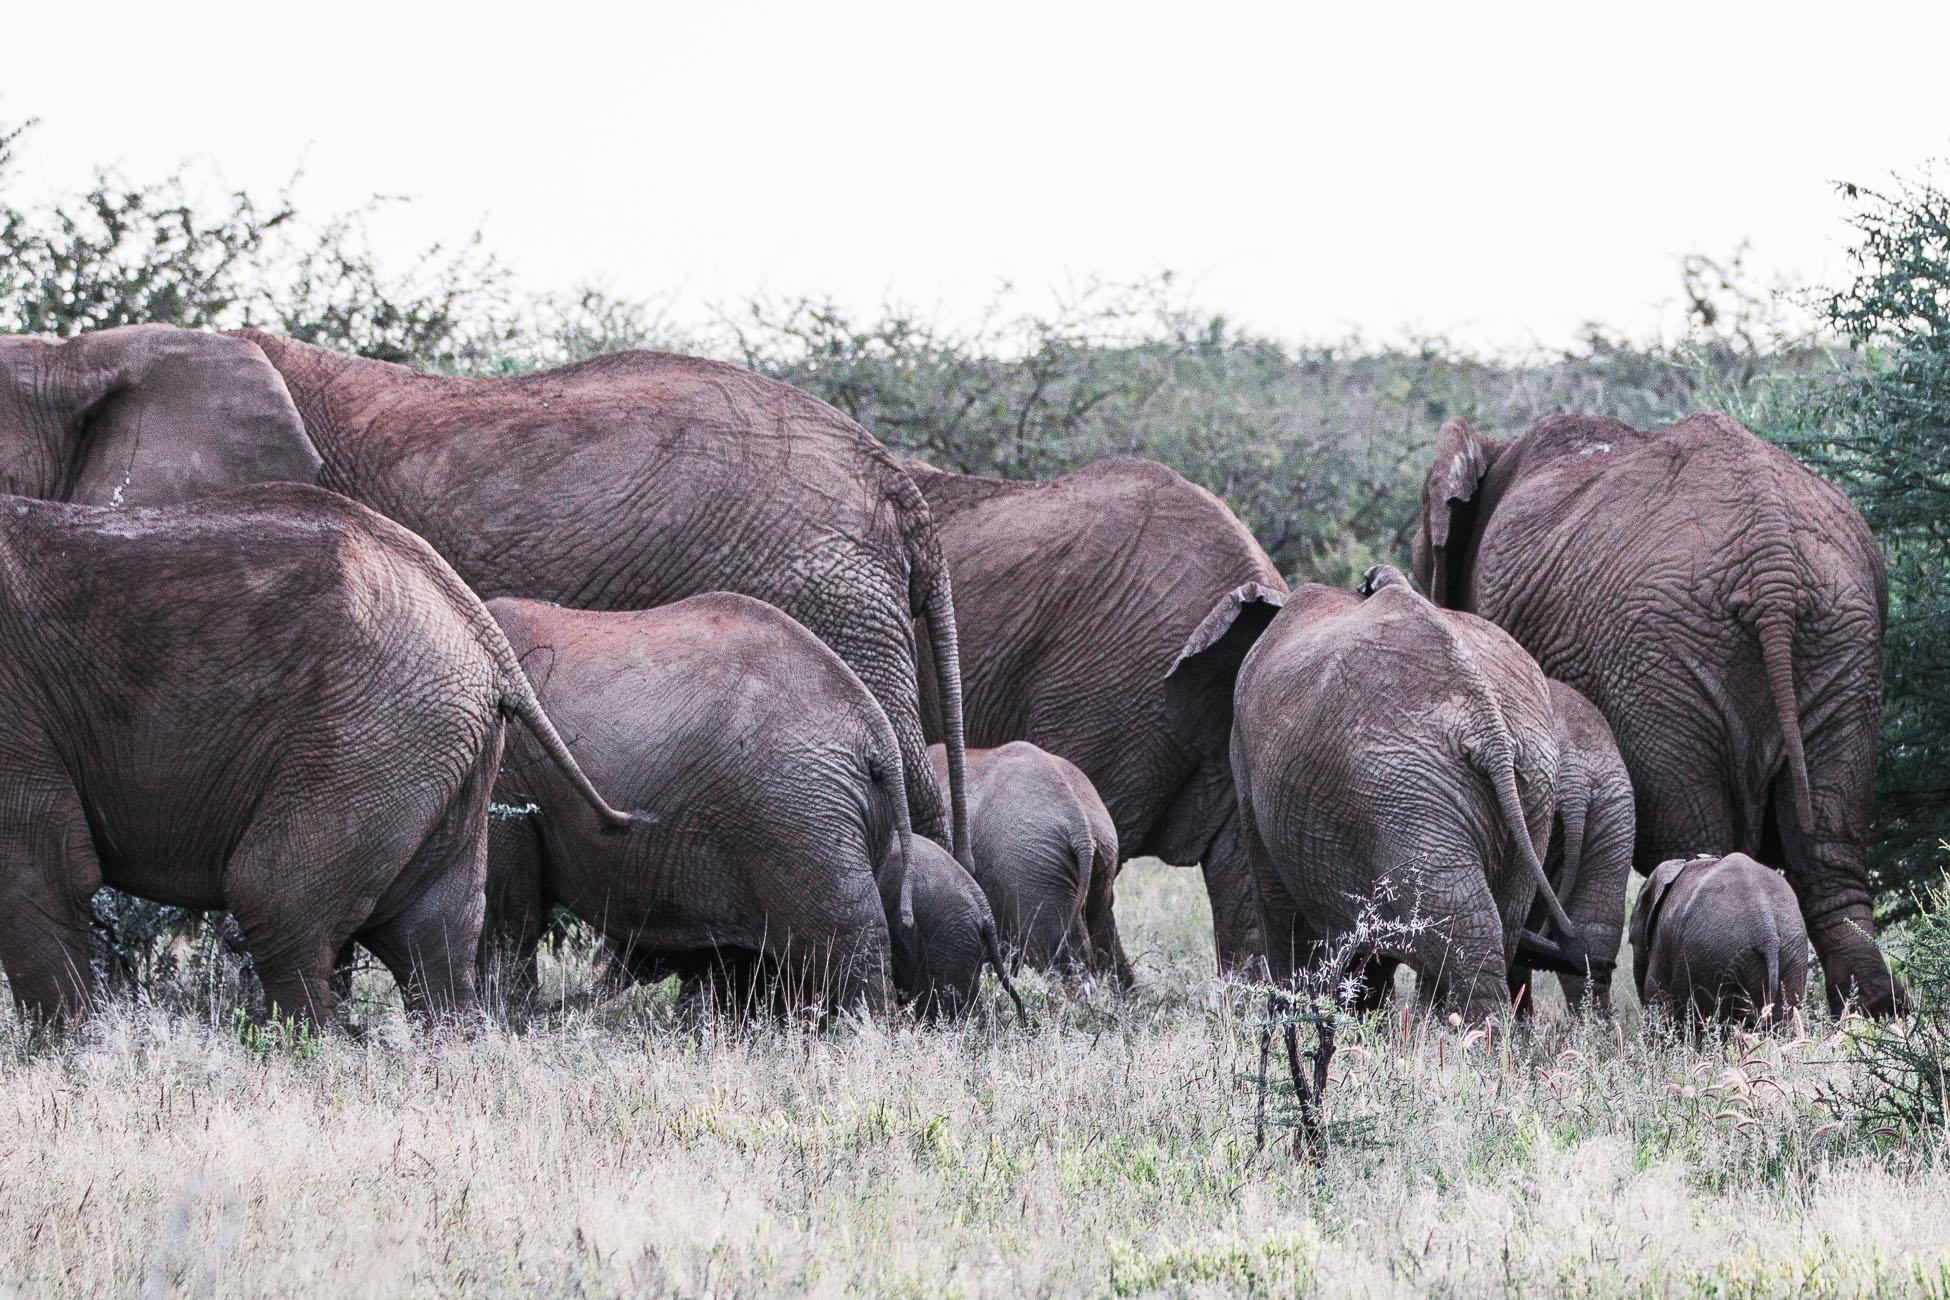 Elephants at a Safari in Namibia